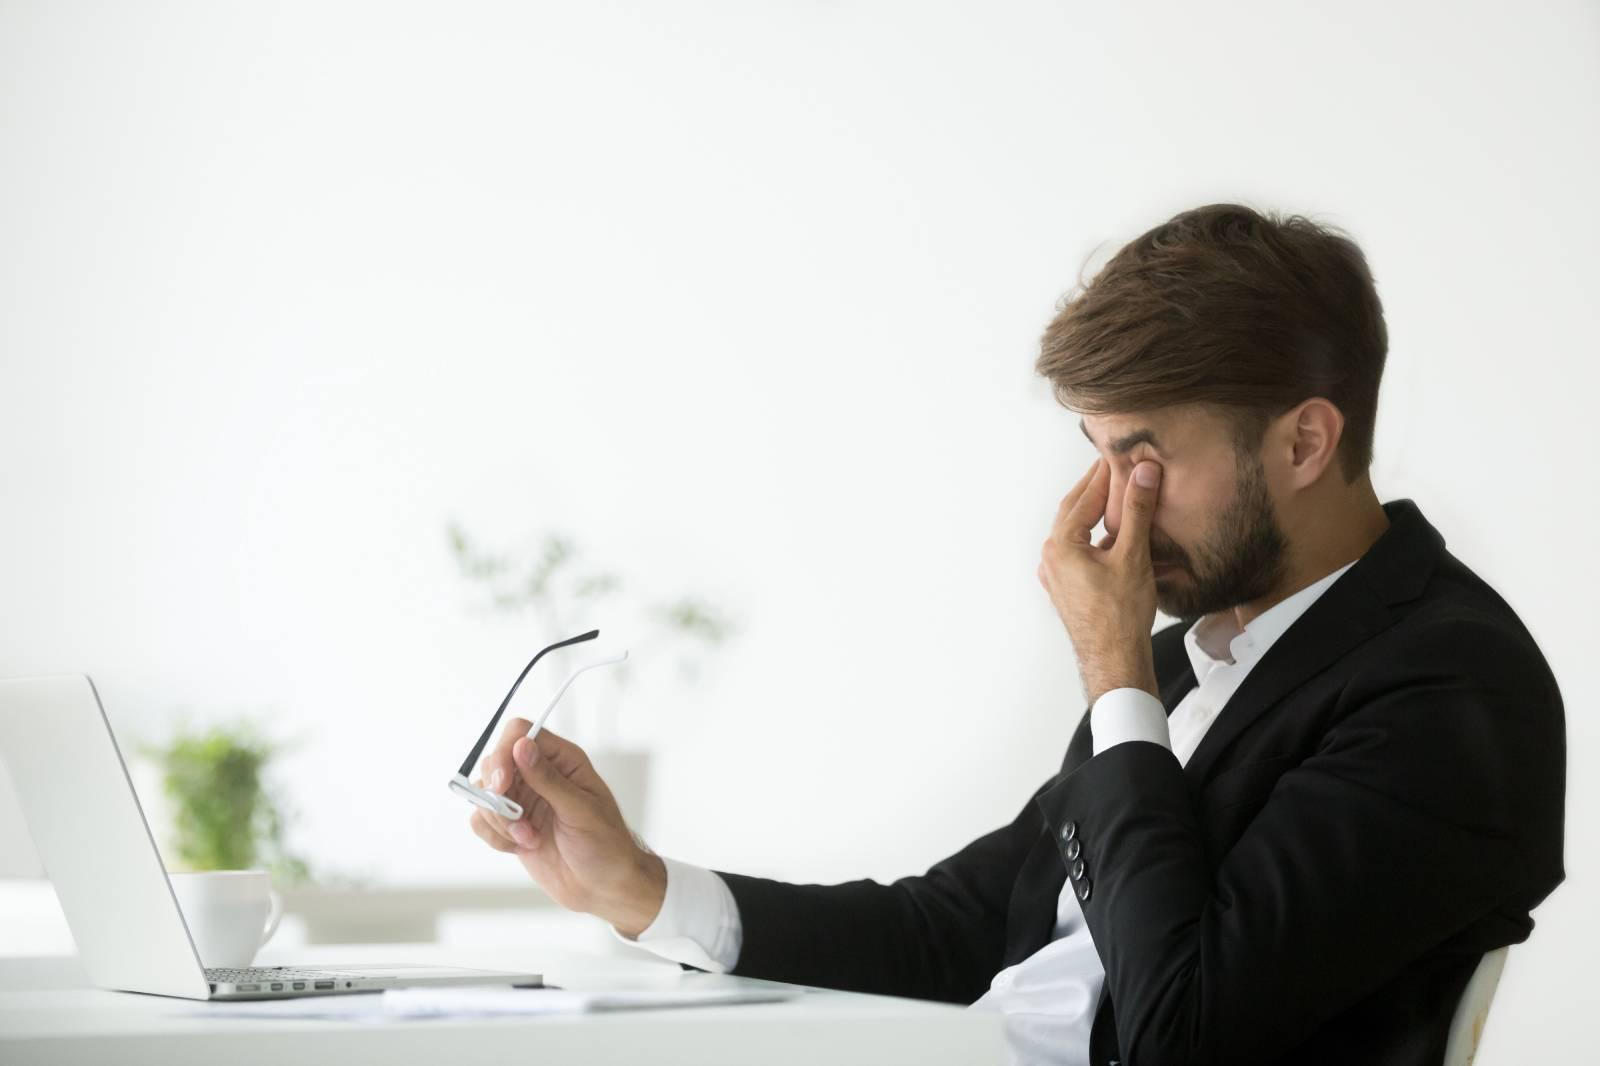 I'm working so hard! Where is my abundance?